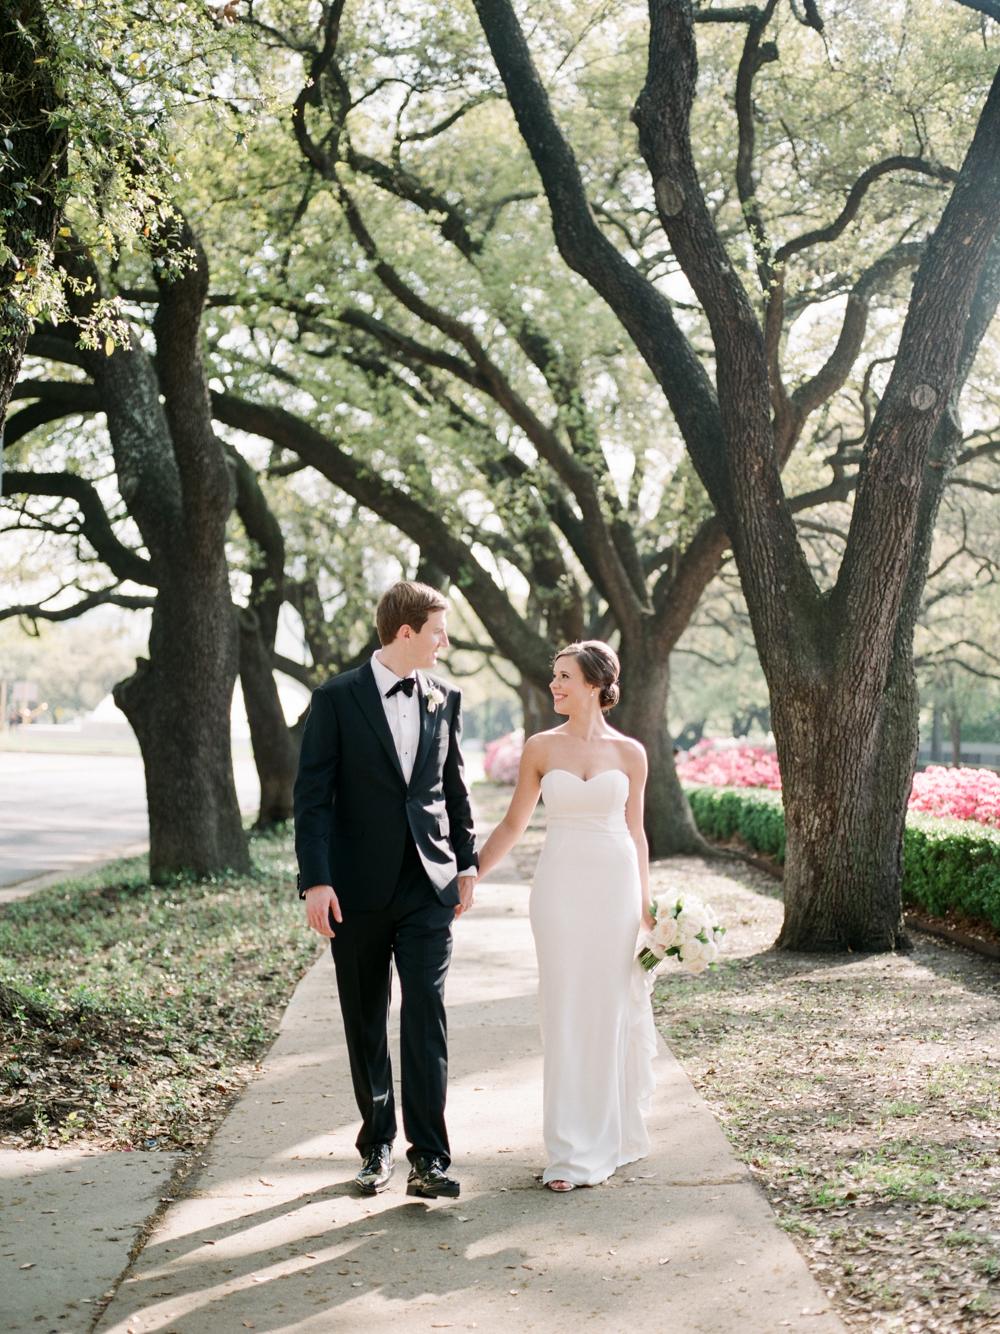 Christine Gosch - destination film photographer - houston wedding photographer - fine art film photographer - elopement photographer - destination wedding - understated wedding - simple beautiful wedding photography-71.jpg